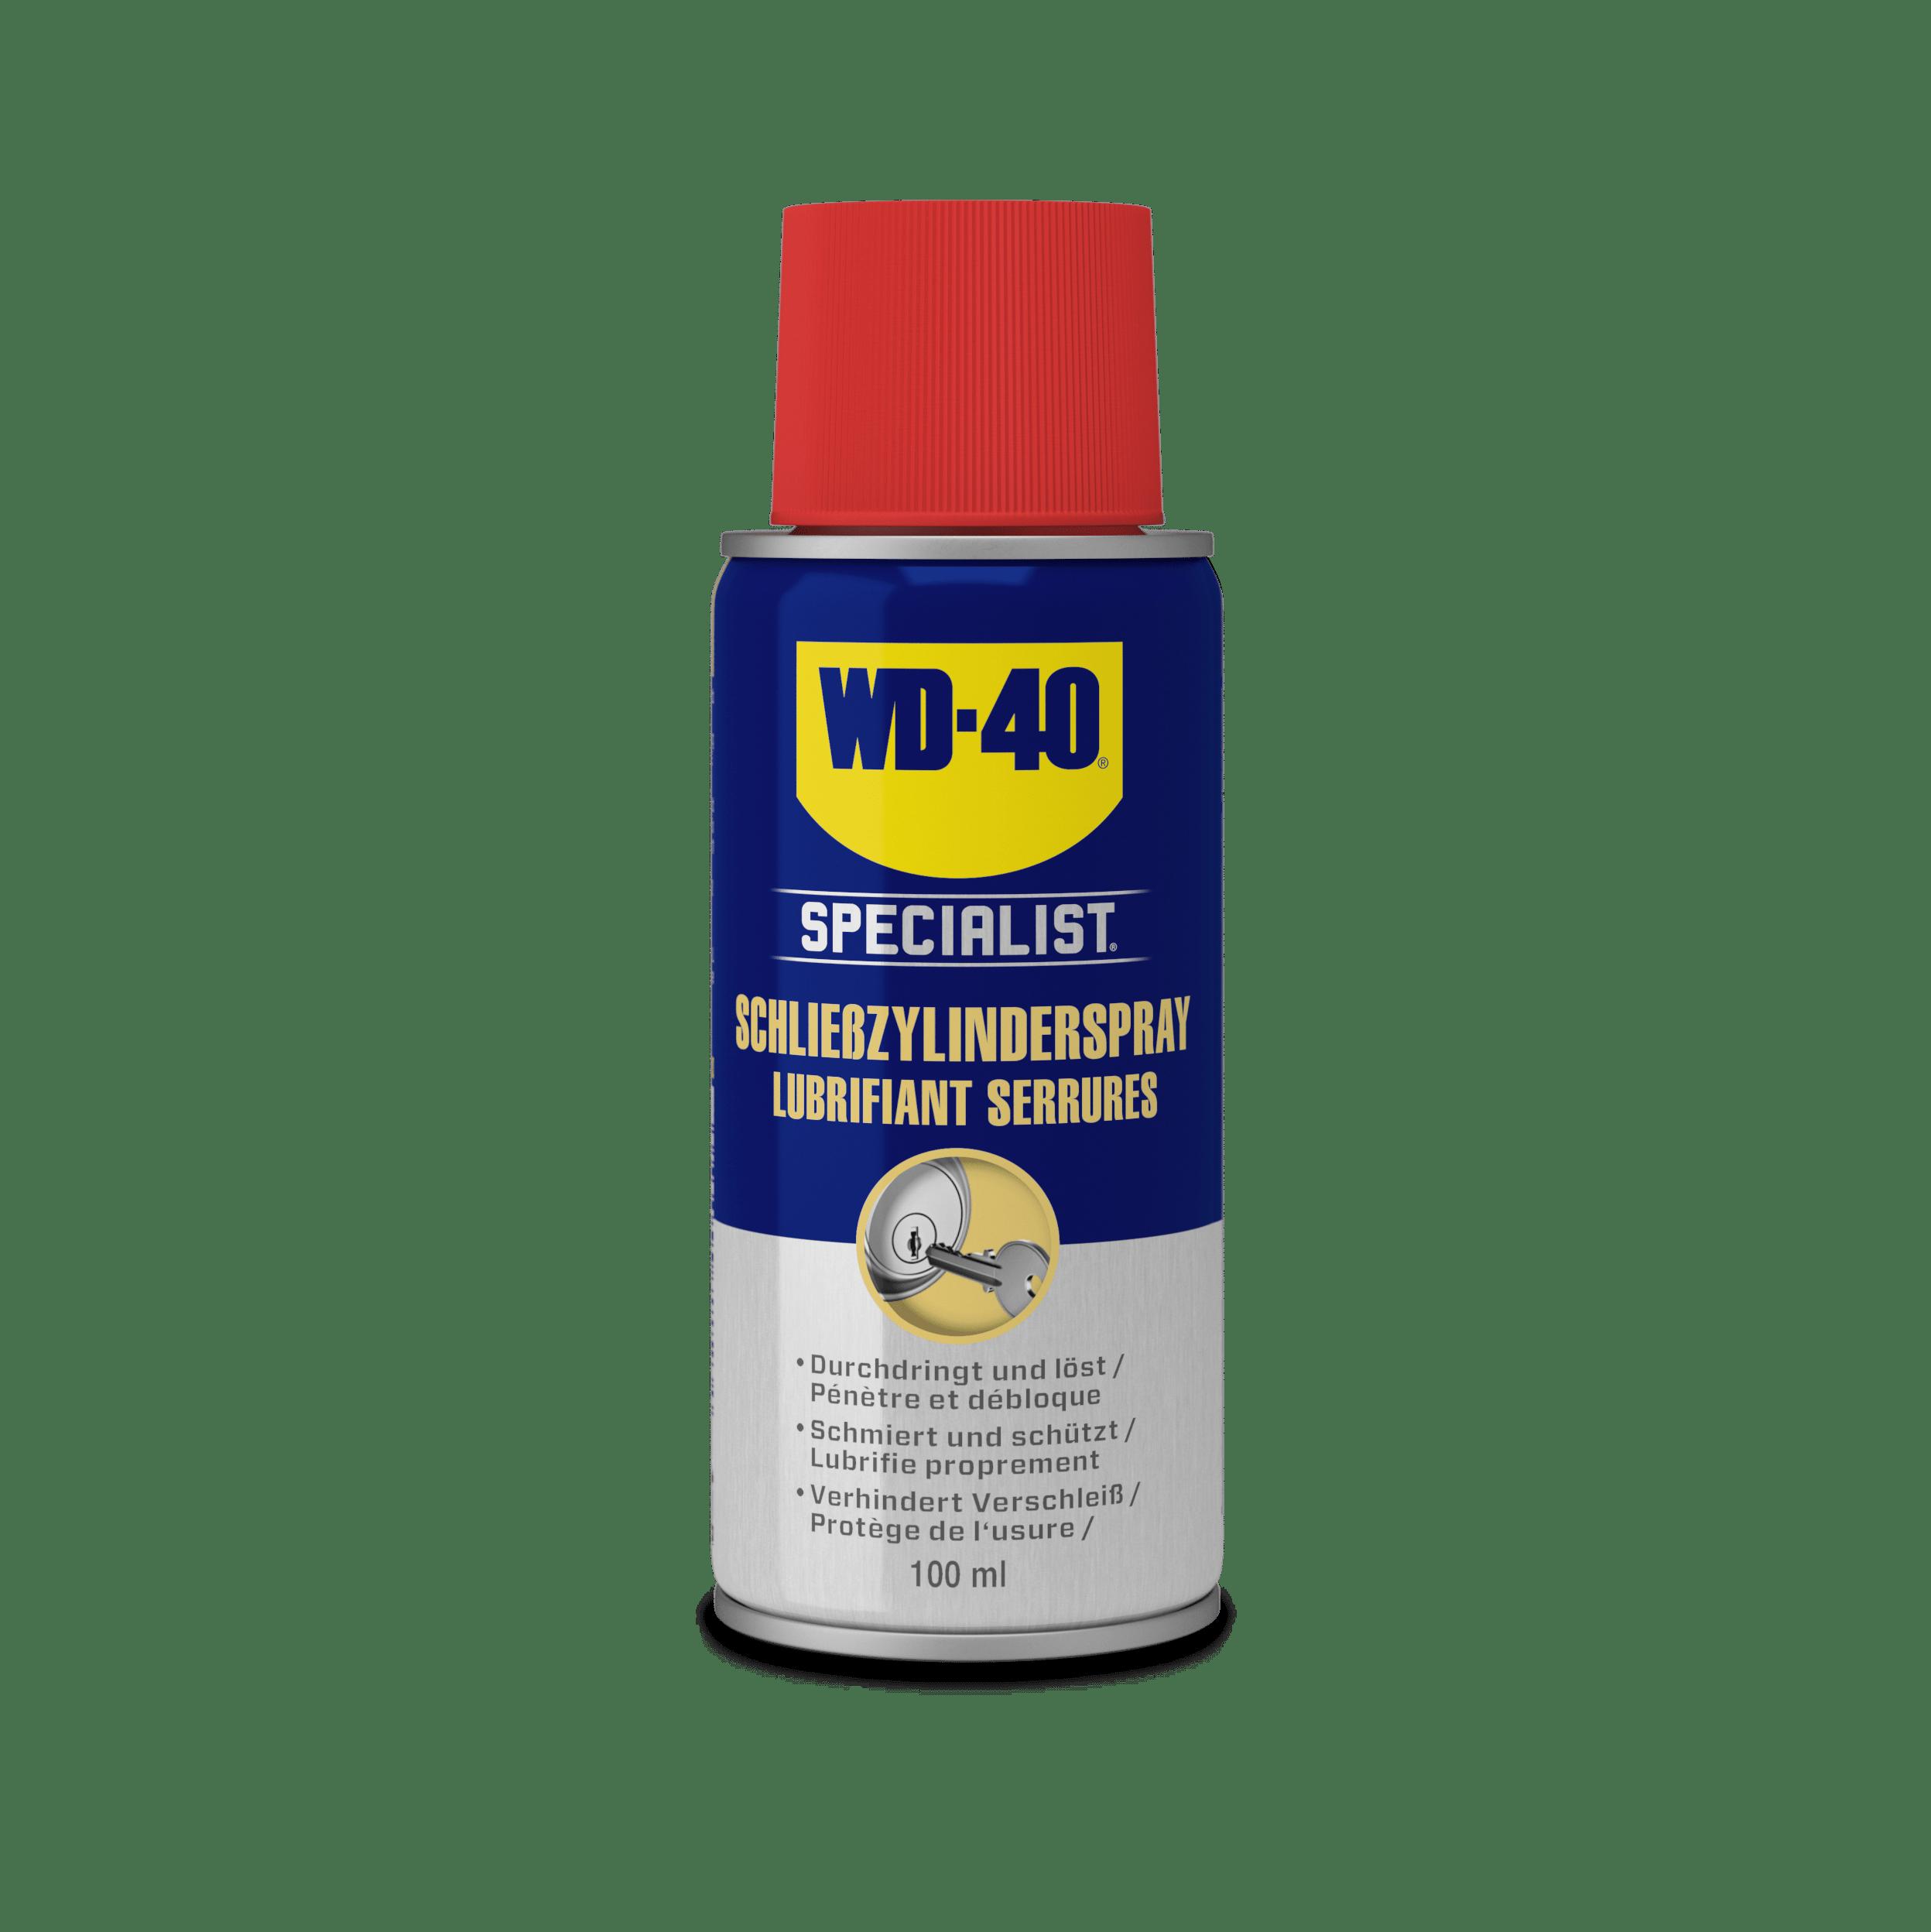 WD-40-SPECIALIST-Schliesszylinderspray-Classic